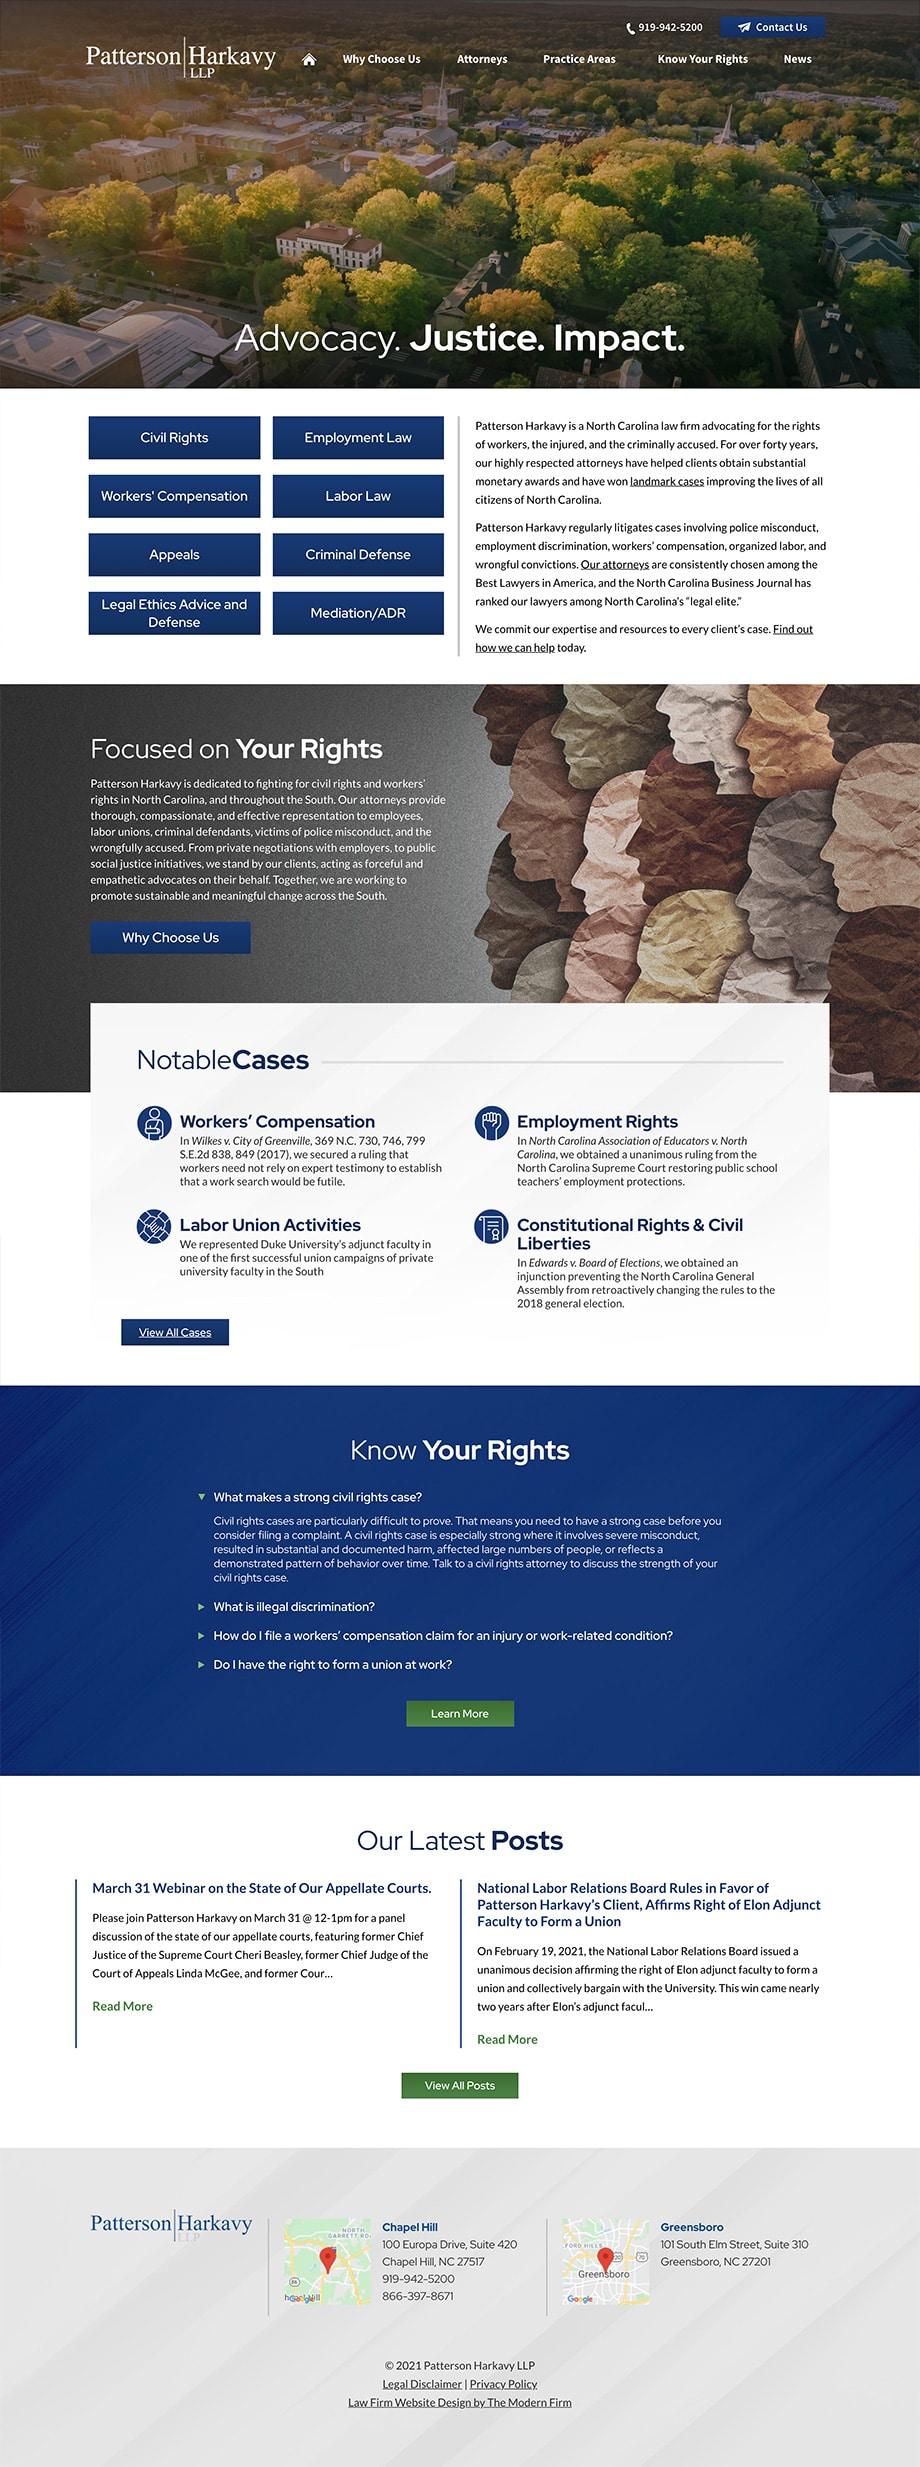 Law Firm Website Design for Patterson Harkavy LLP